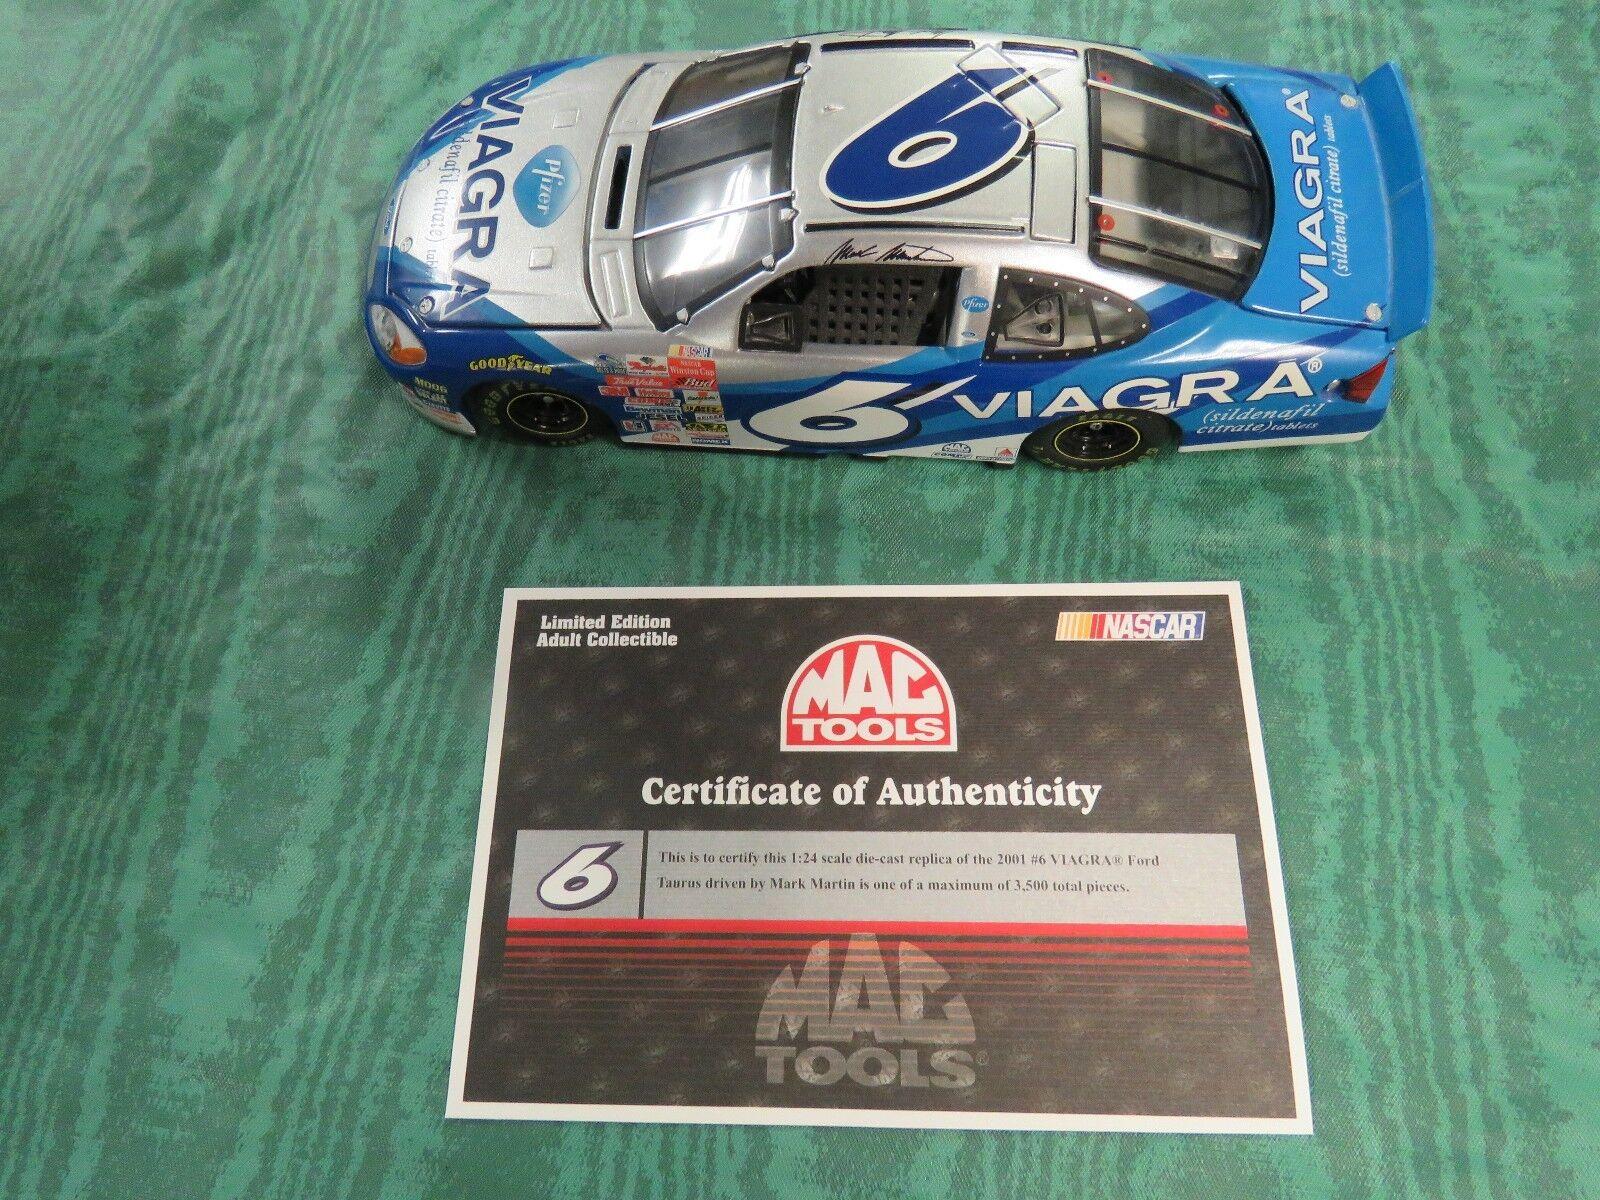 NASCAR 1 24 DIECAST,MARK MARTIN,FORD TAURUS,MAC TOOLS,LIMITED EDITION